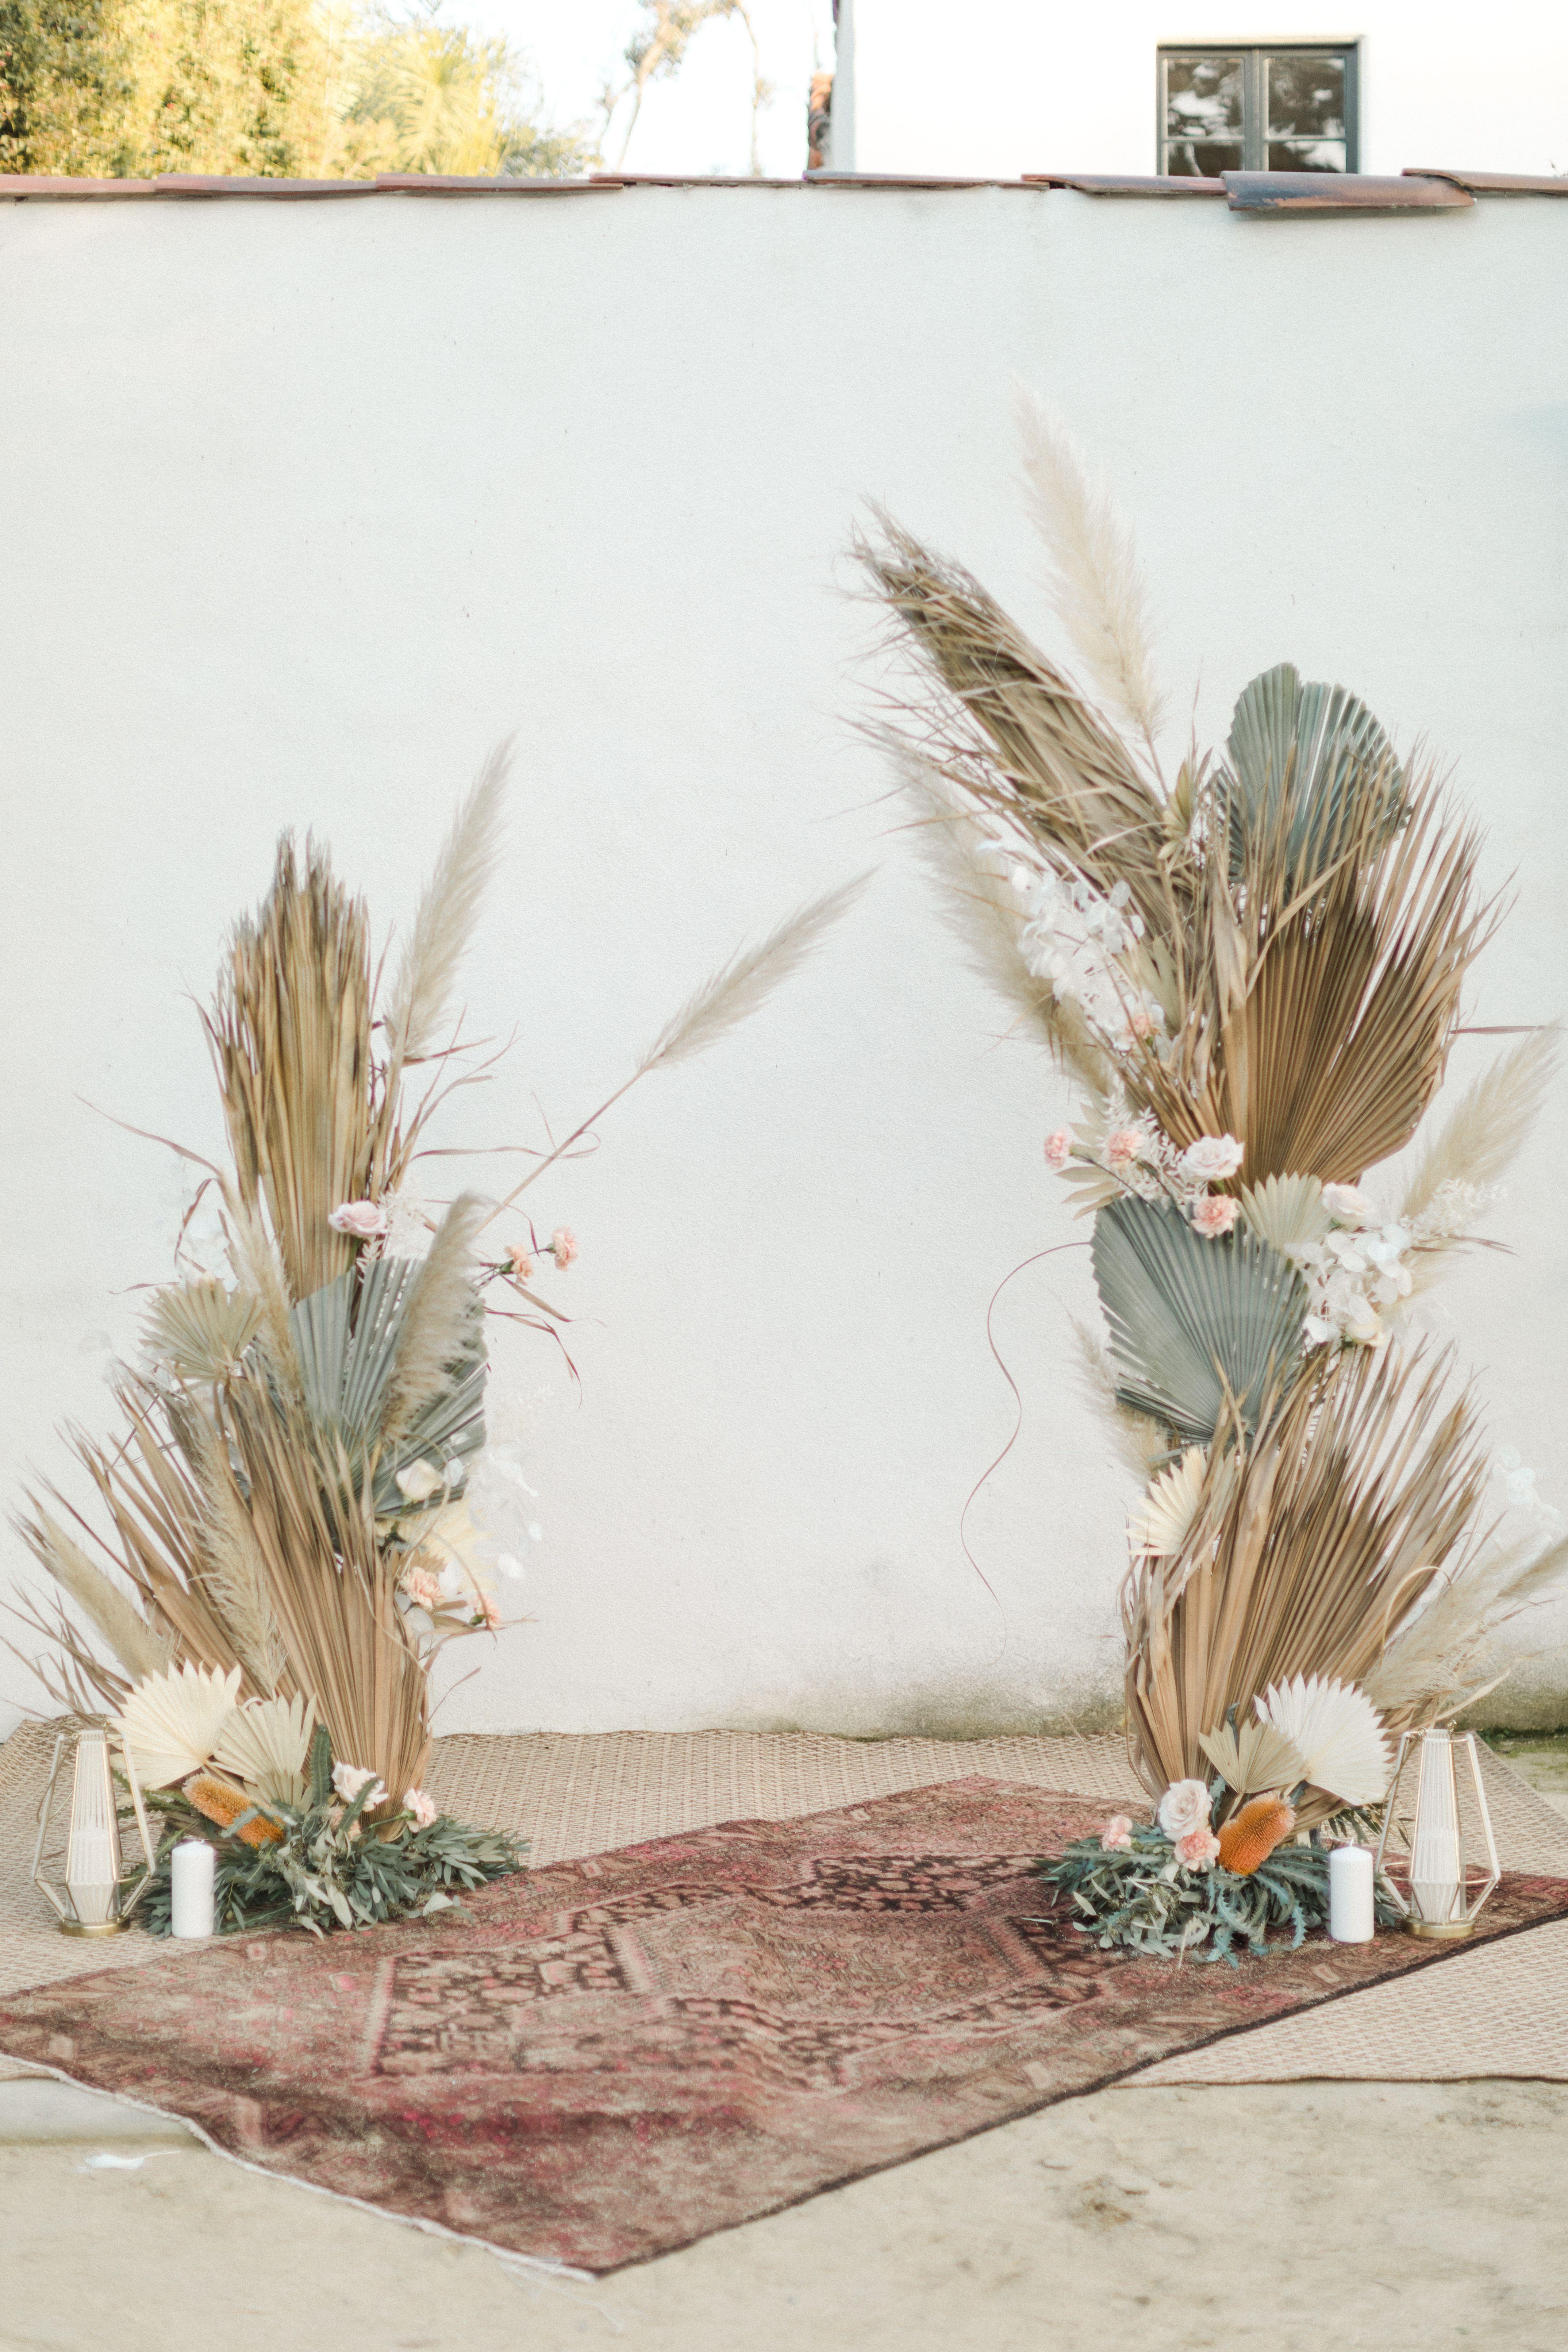 Boho Dried Palm Alter Pampas Grass Garland Dried Palm Wedding Palm Wedding